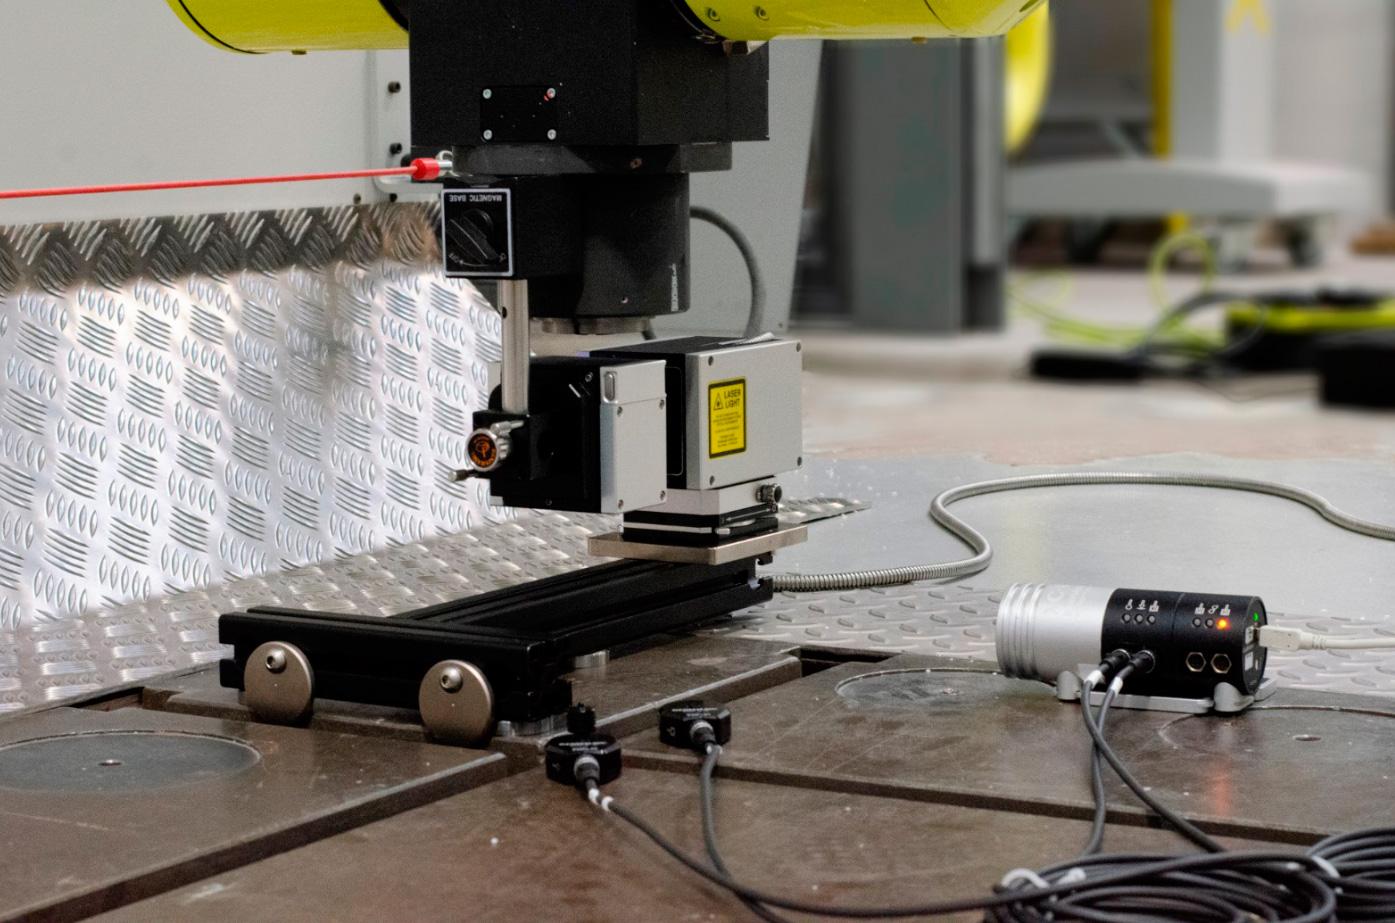 Paquete integrado de software para productos de calibrador